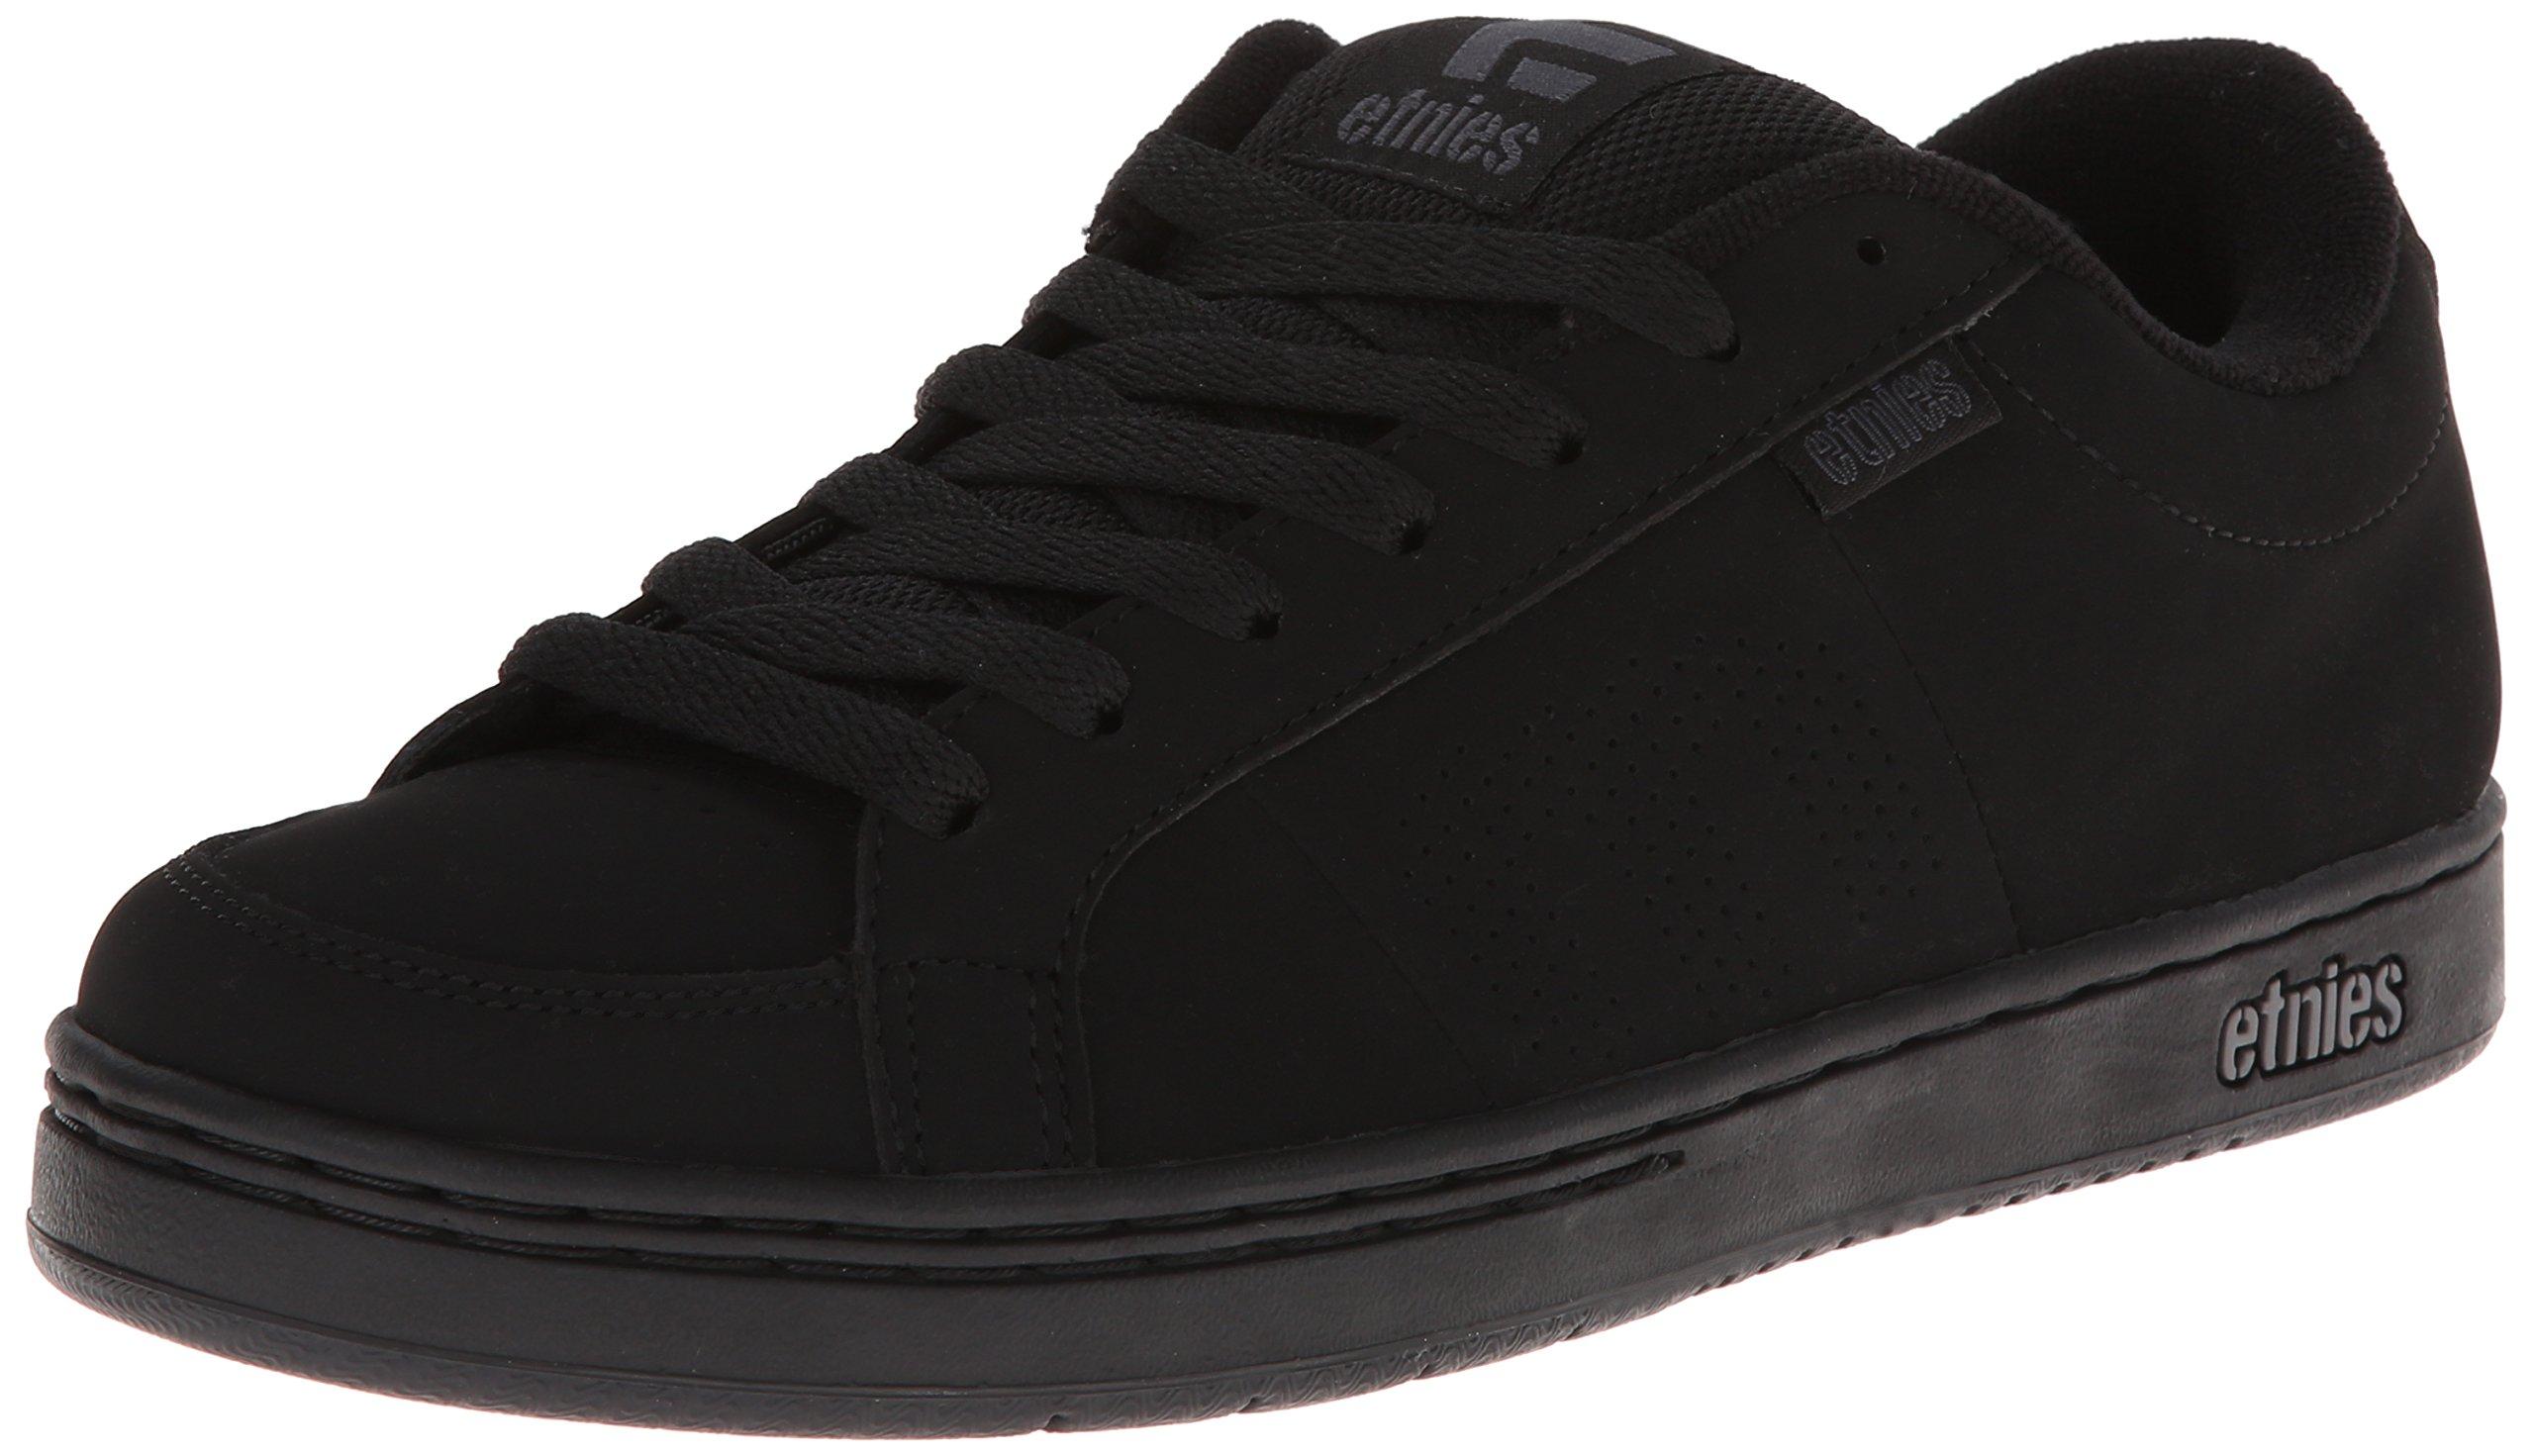 Etnies Men's Kingpin Skate Shoe, Black, 10 Medium US by Etnies